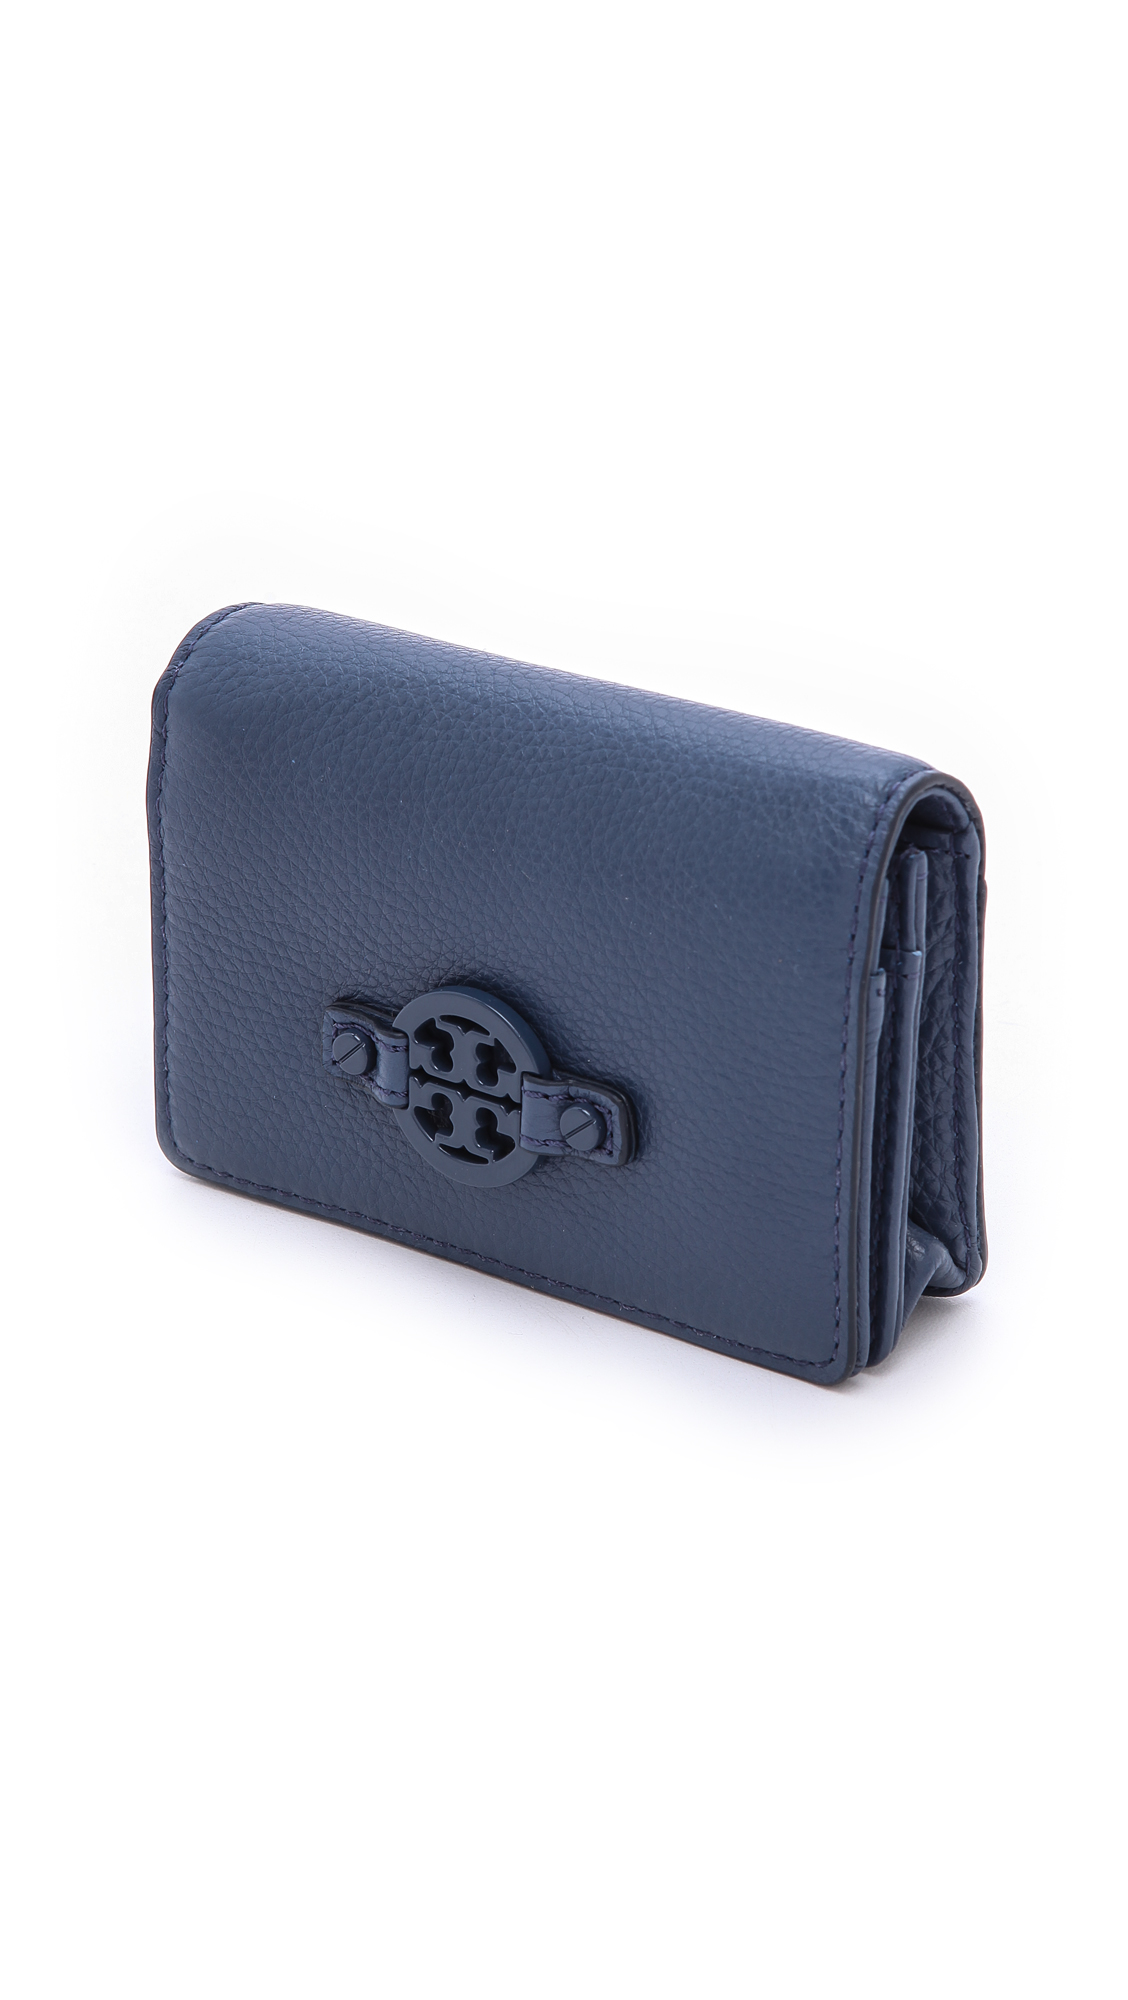 Lyst - Tory Burch Amanda Foldable Card Case in Blue